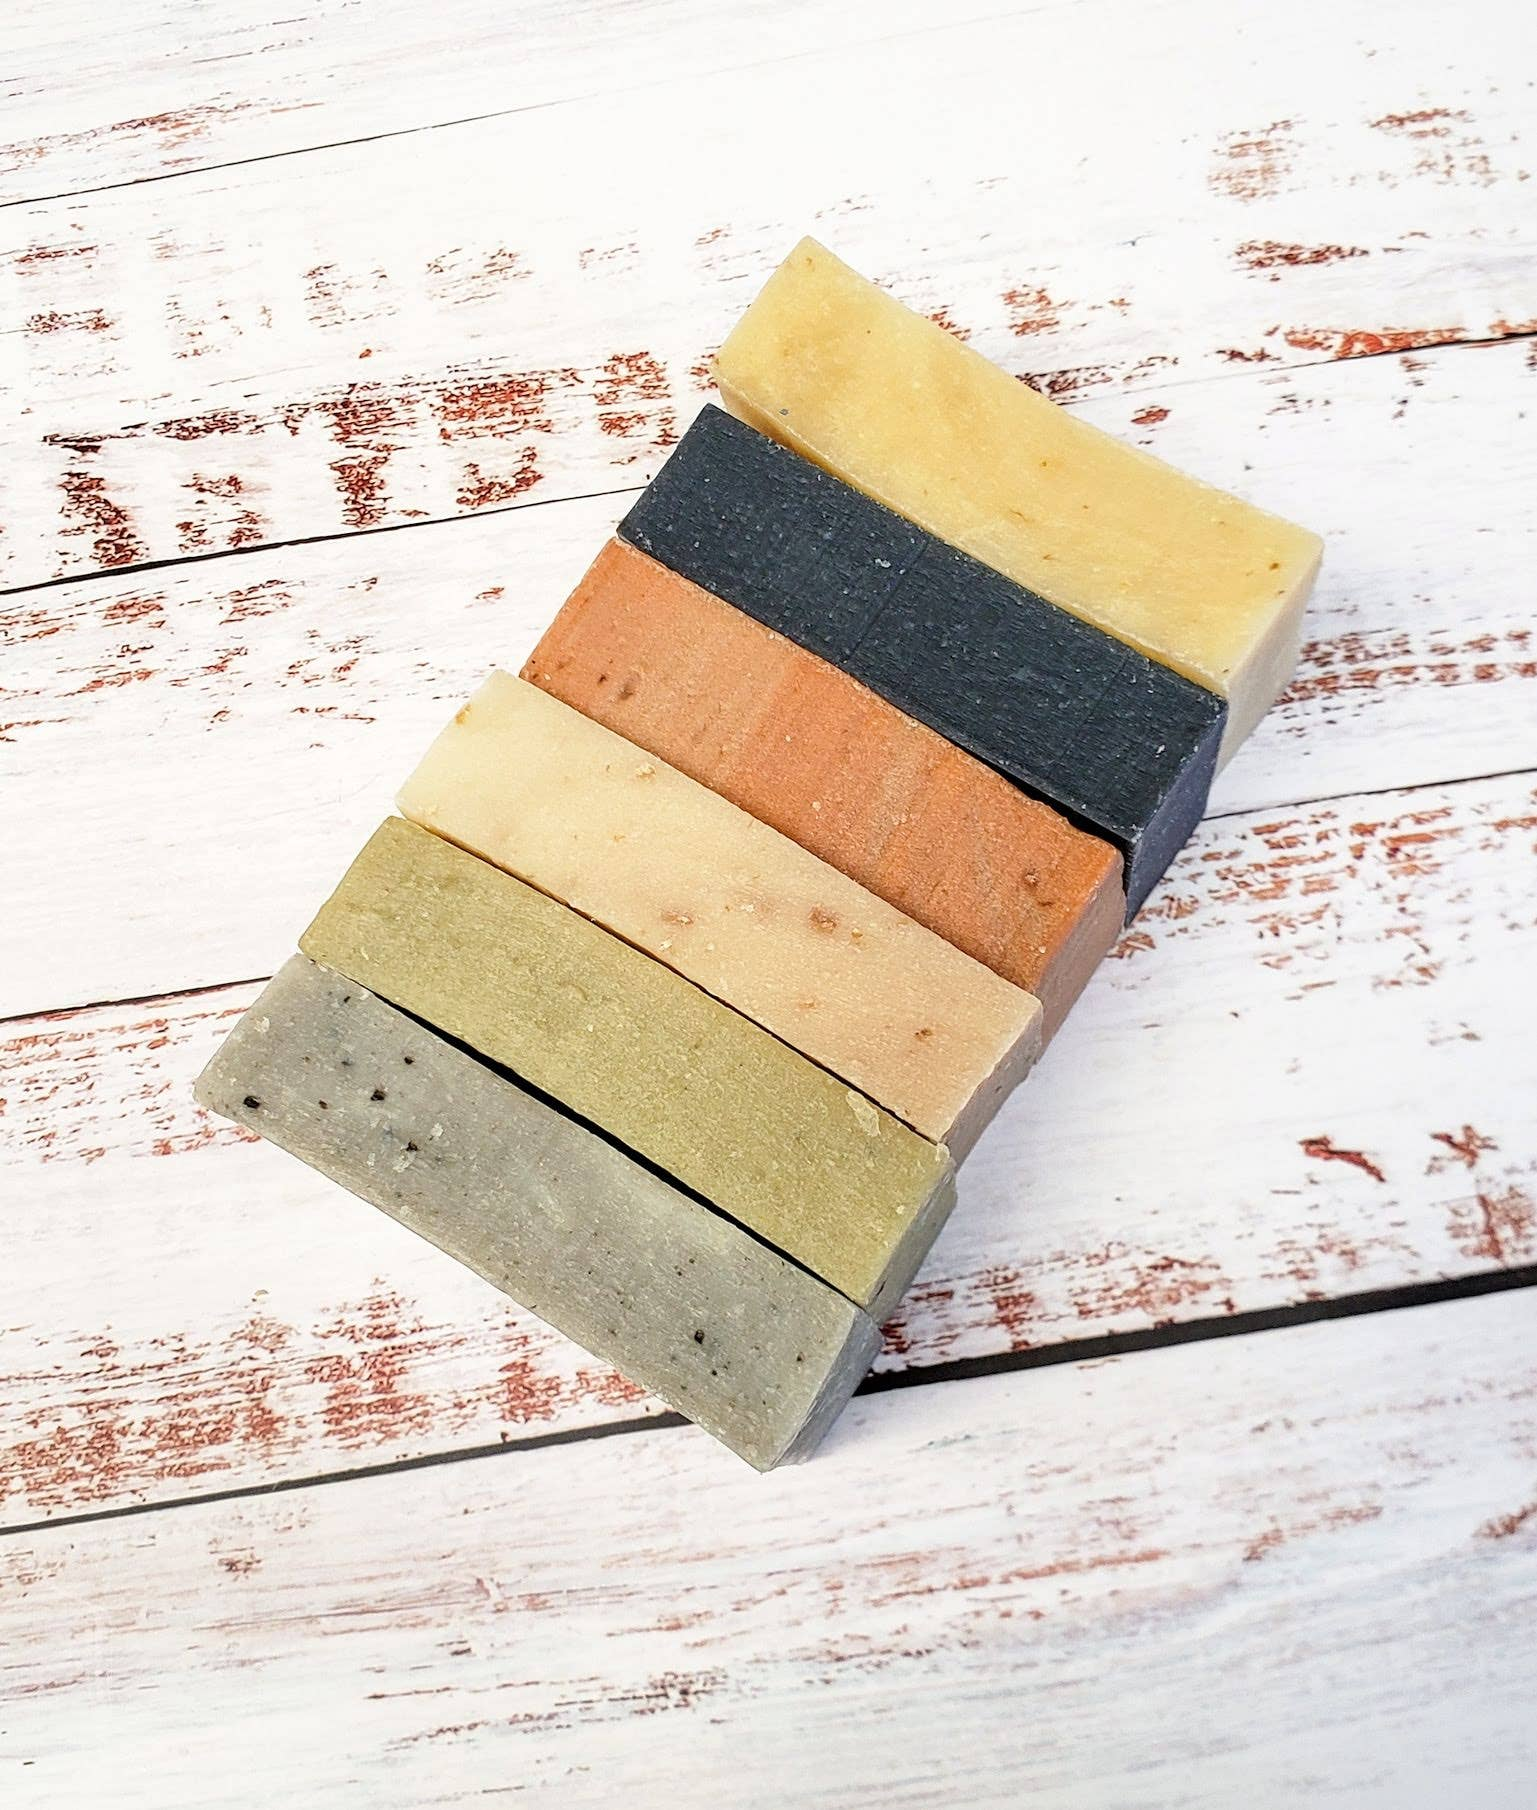 Evolve - Bulk Raw Soaps - Standard Soaps | Trada Marketplace